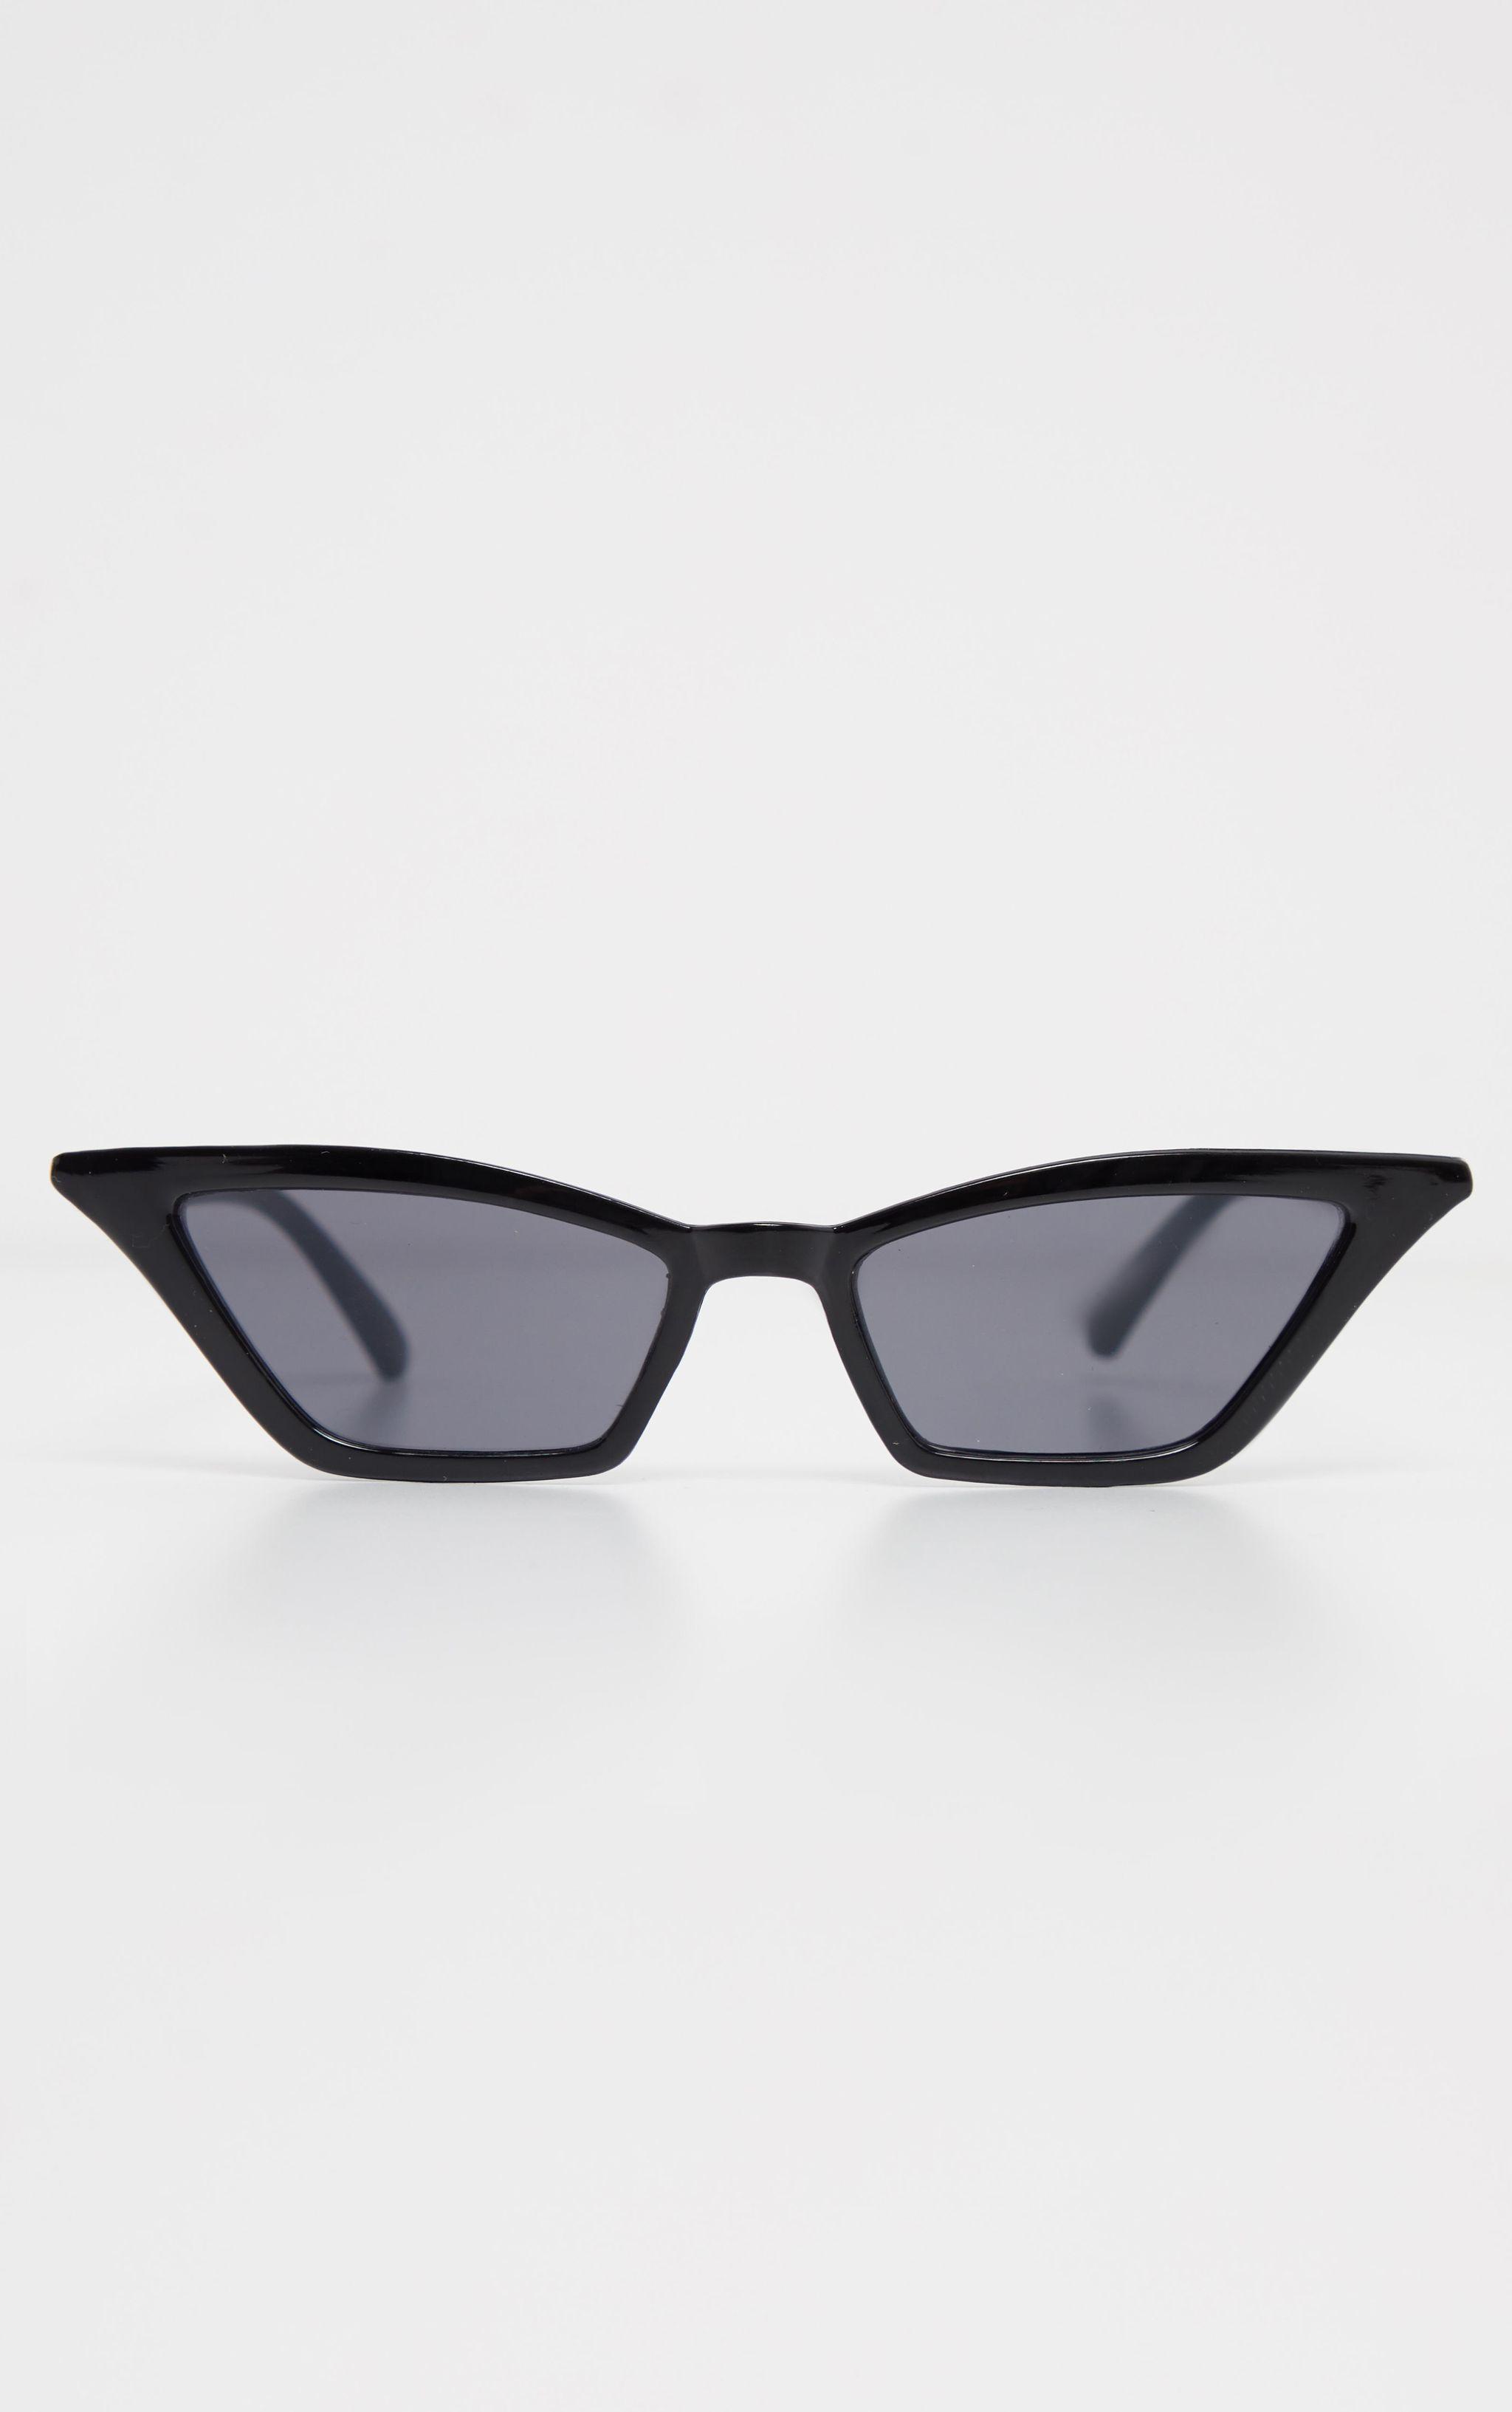 b64d4762e2 Black Narrow Slim Angular Cat Eye Sunglasses in 2019 | guardado ...